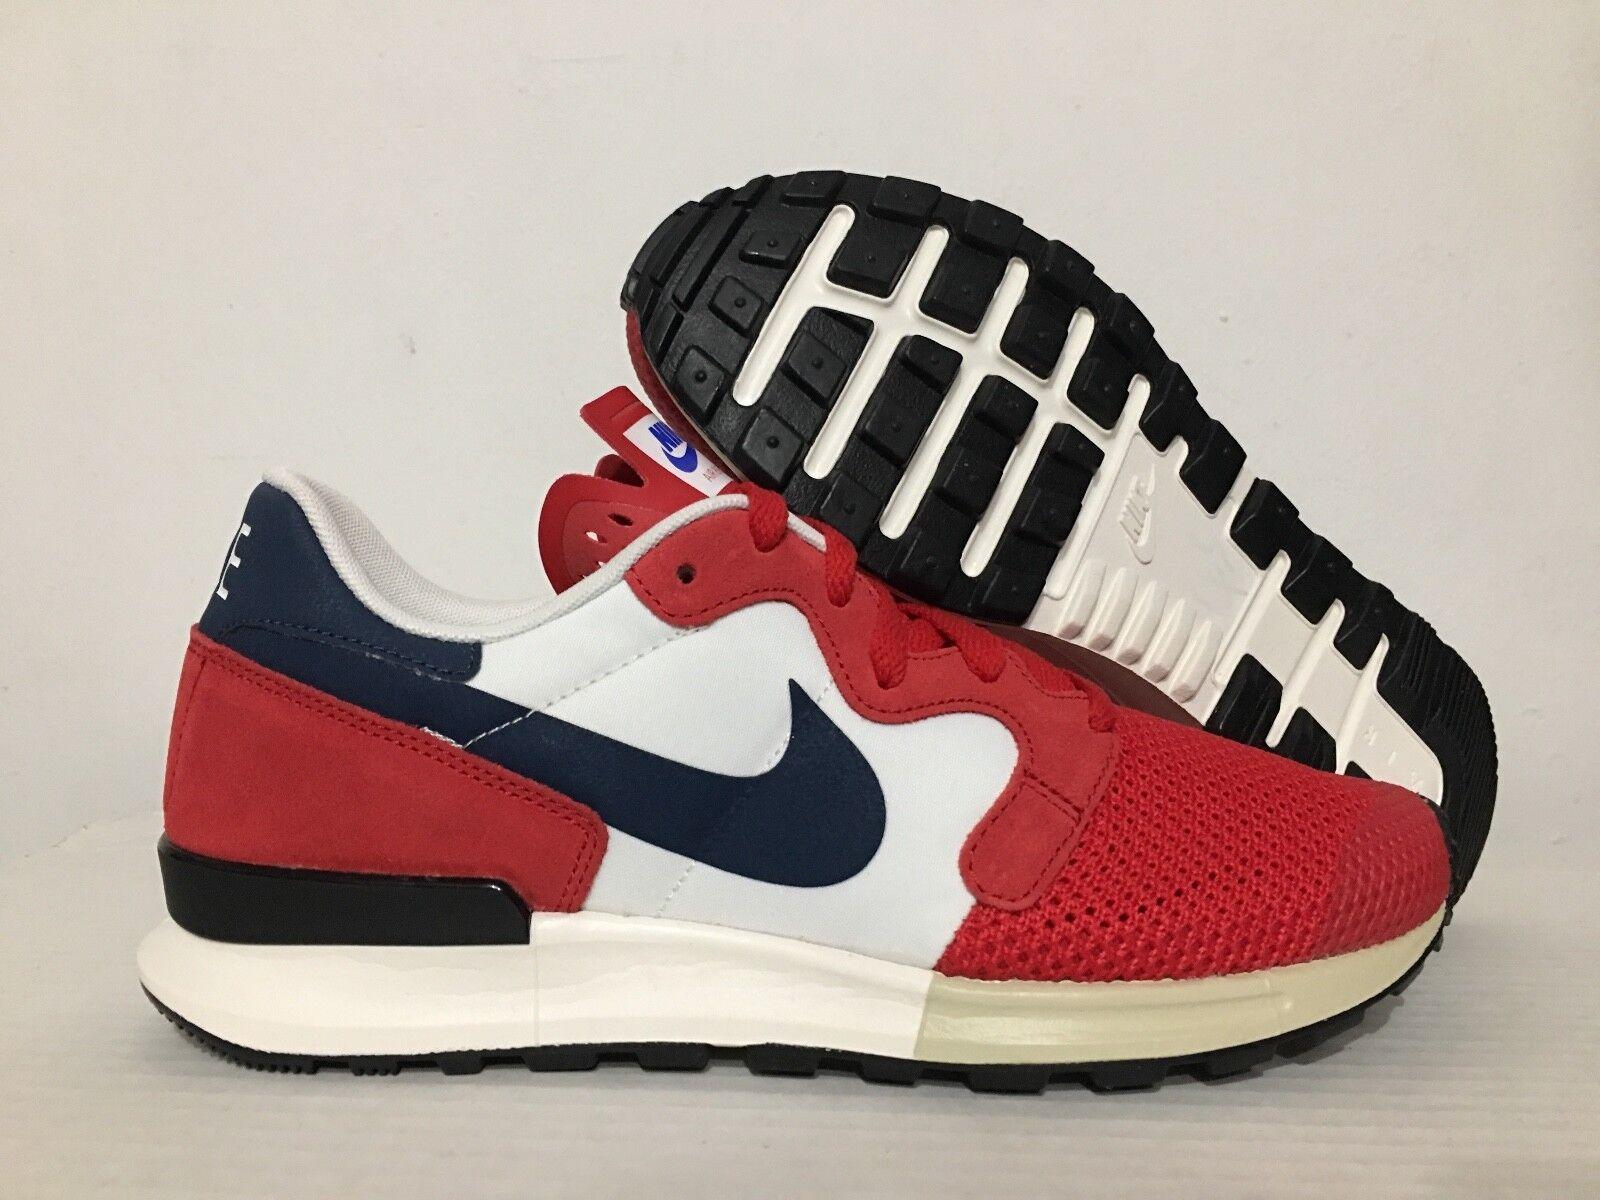 Usa Air Shoes Nike White Blue Red Berwuda Running Retro dIww7qP